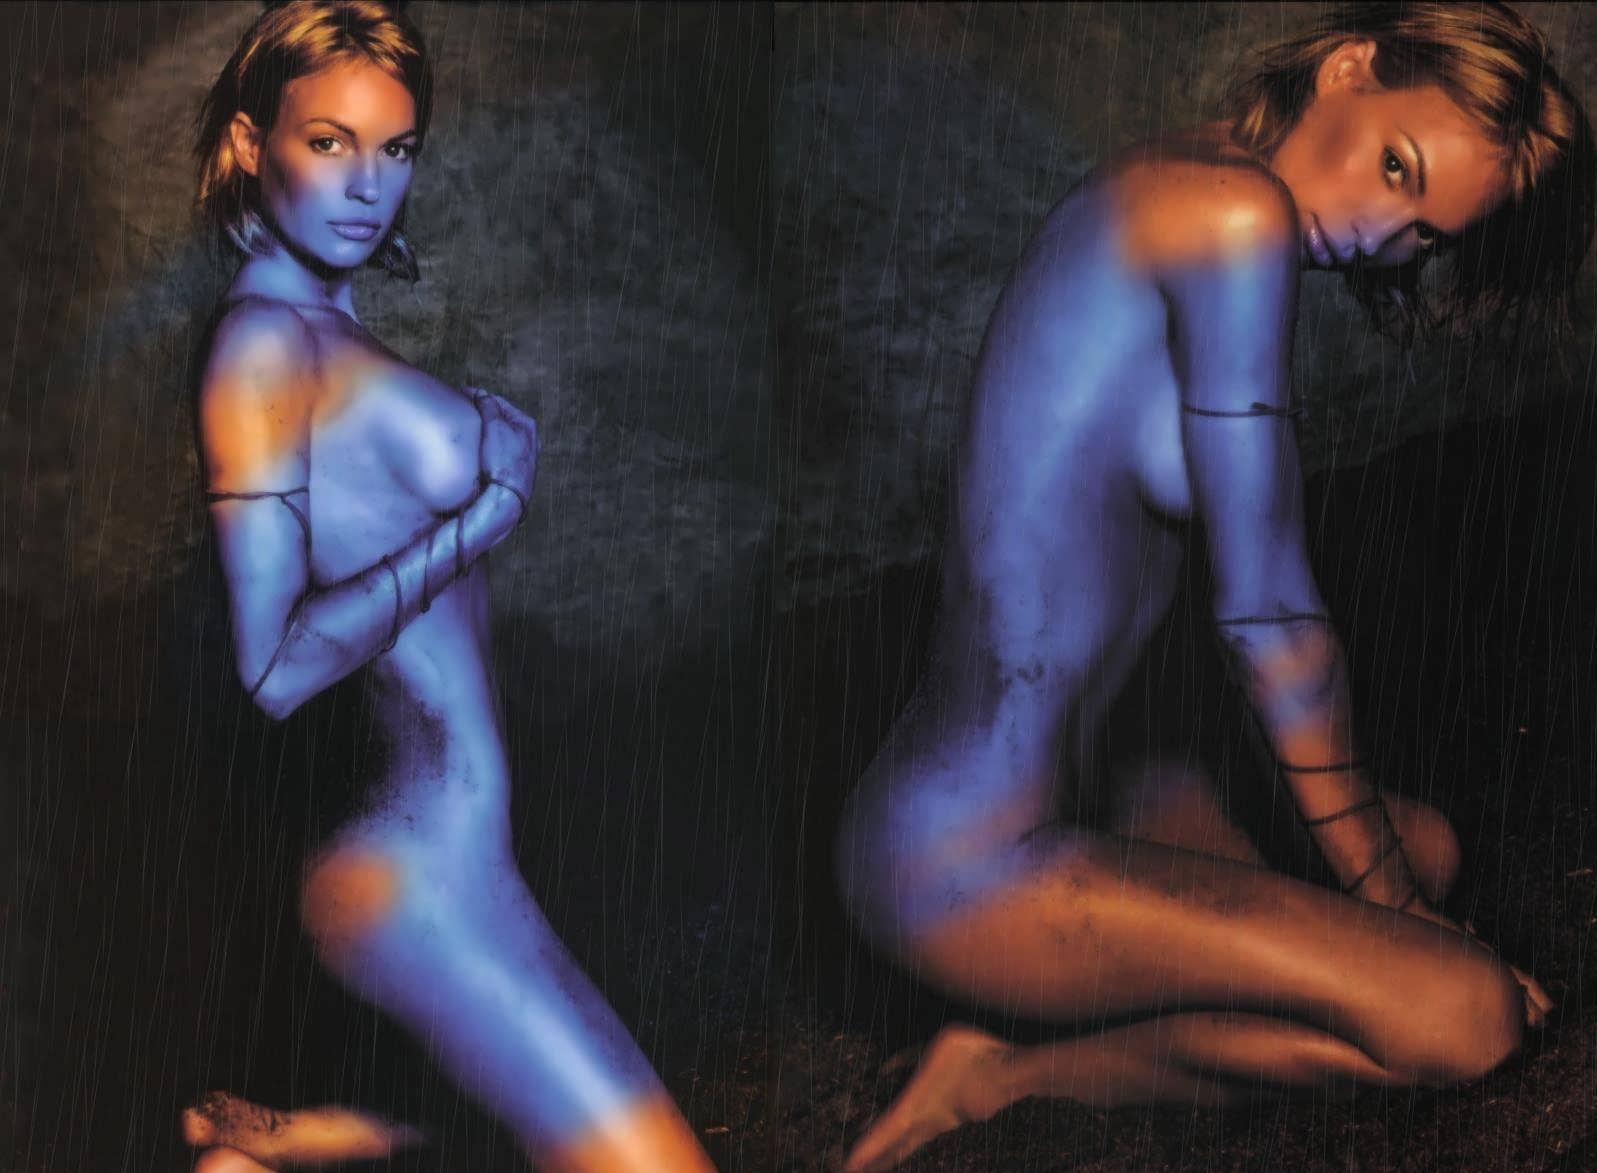 Jolene blalock nude pics naked sex scenes compilation